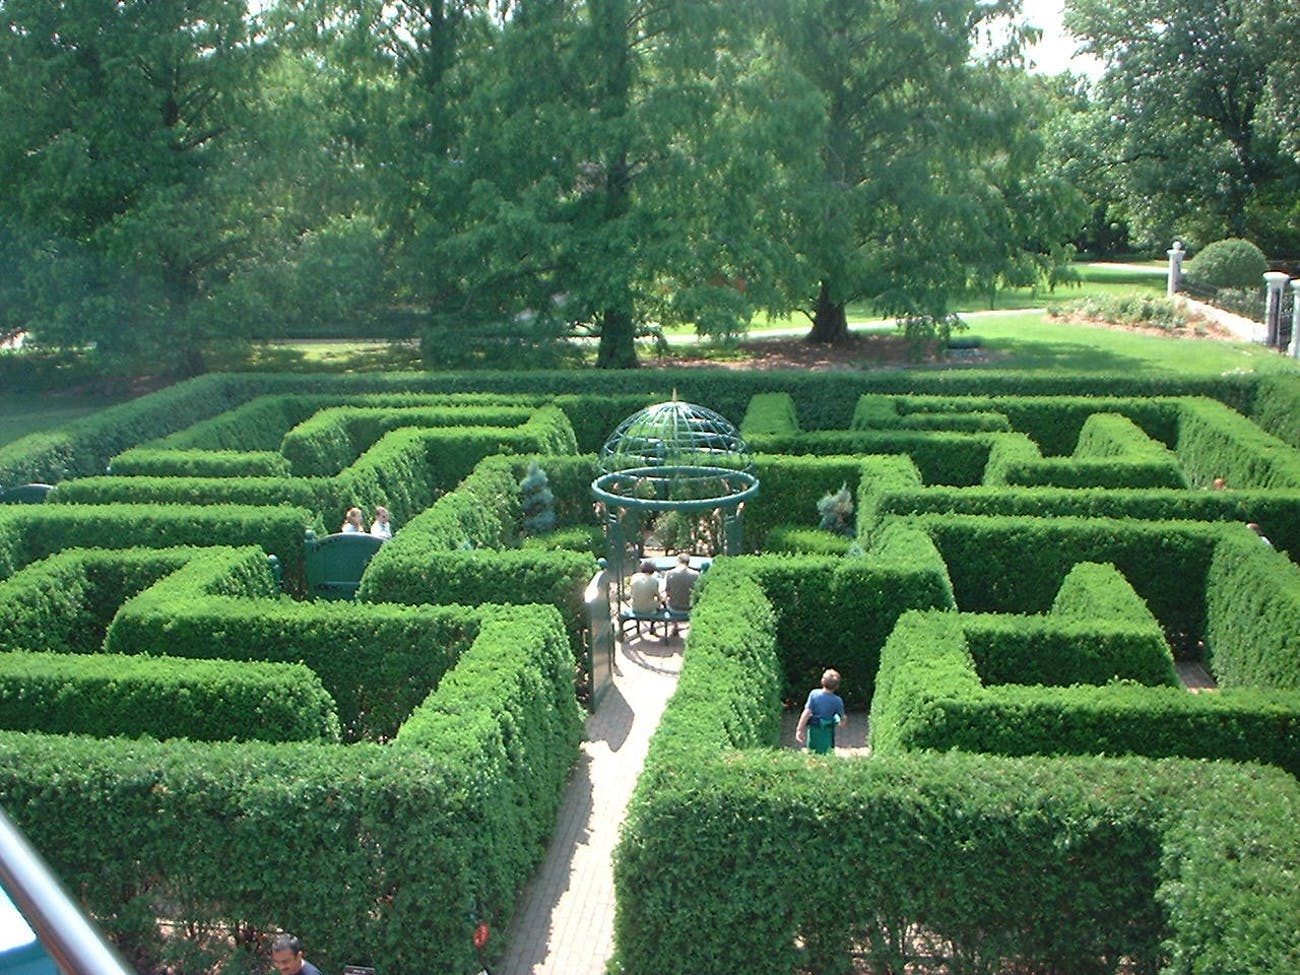 A hedge maze in St. Louis Botanical Gardens in Missouri.